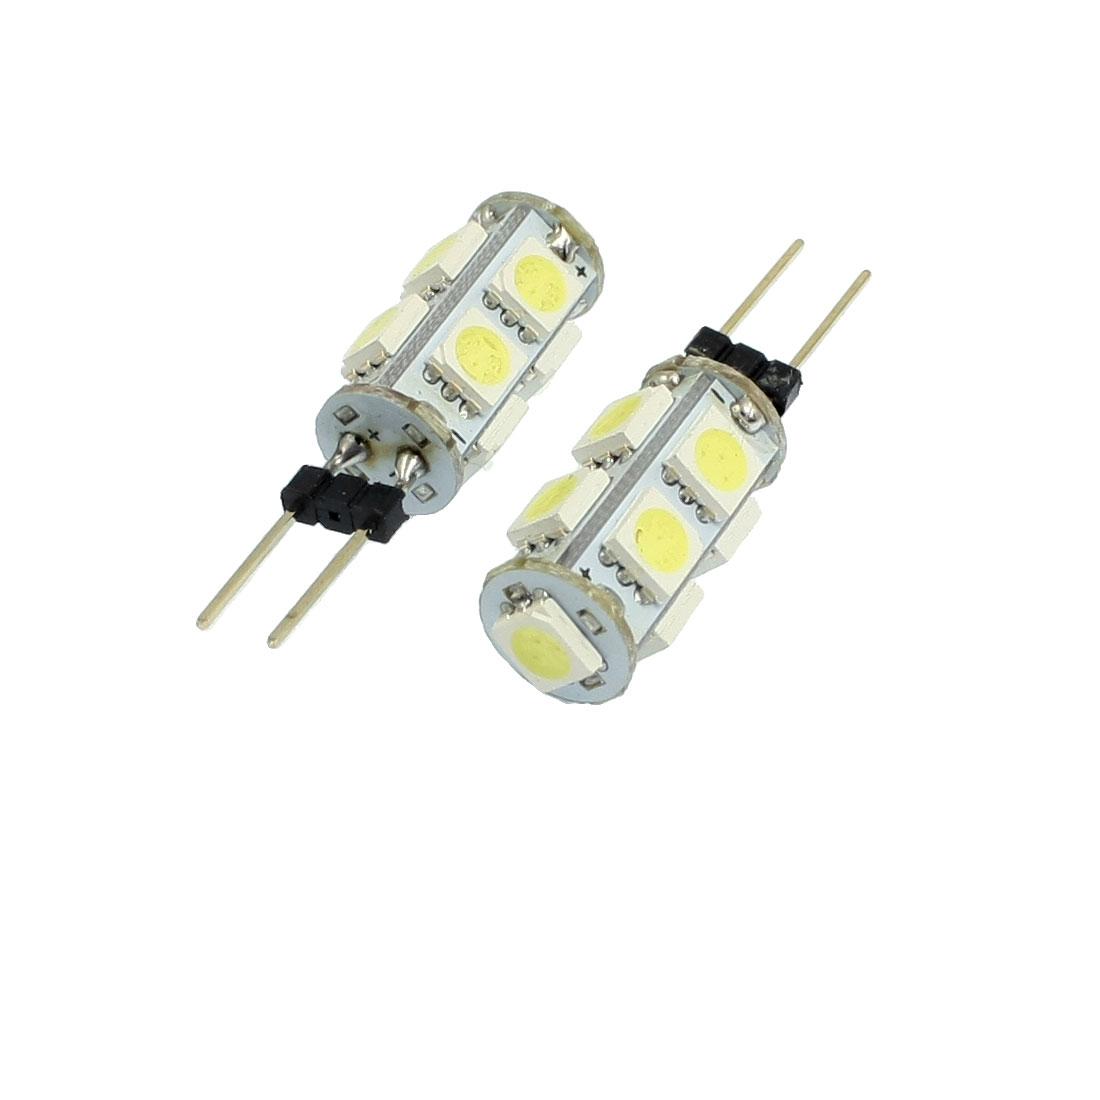 2 Pcs Car G4 White 5050 SMD 9-LED Bulb Light Dashboard Lamp